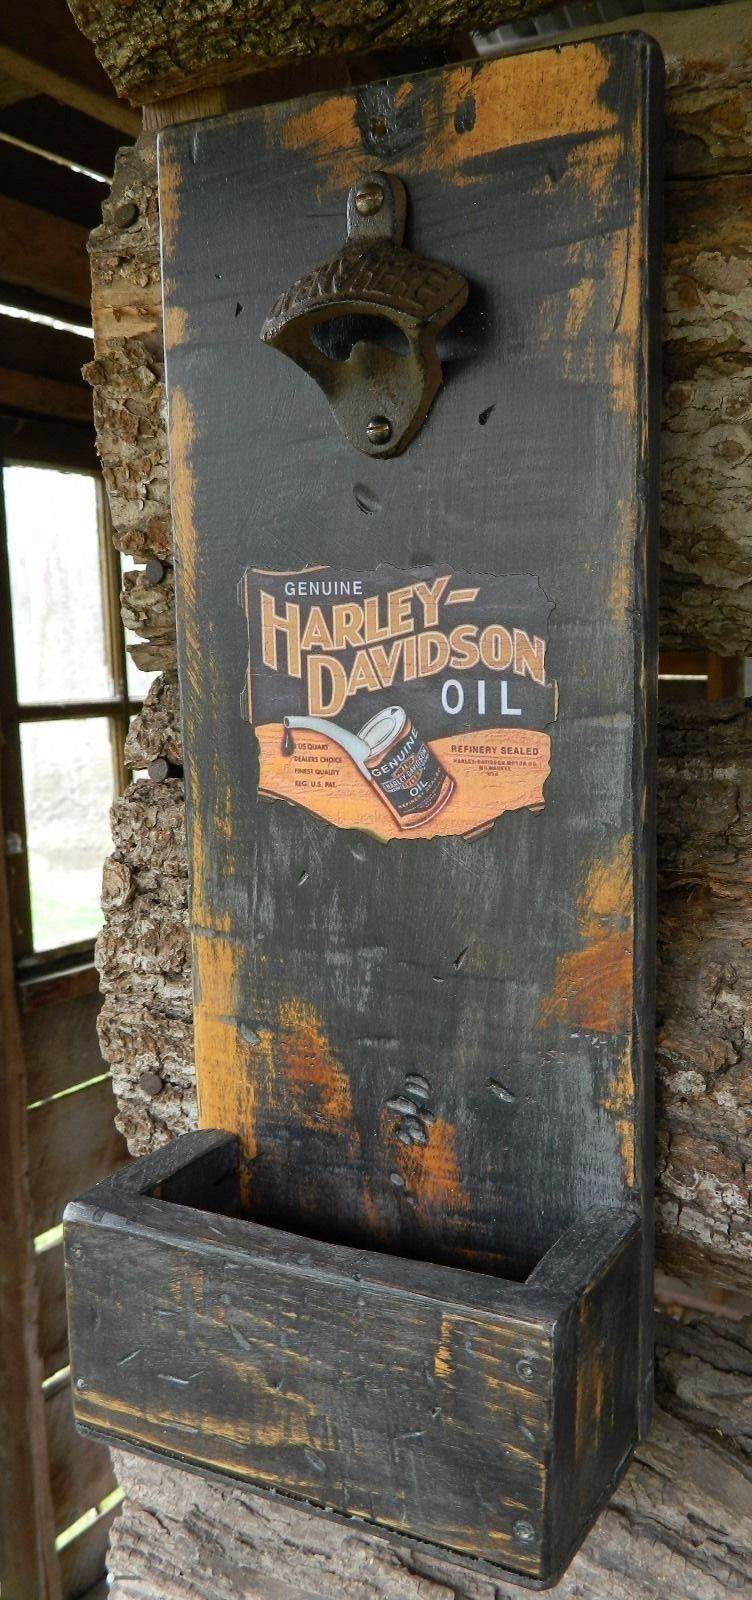 Man cave garage wall mounted bottle opener see more on ebay seller